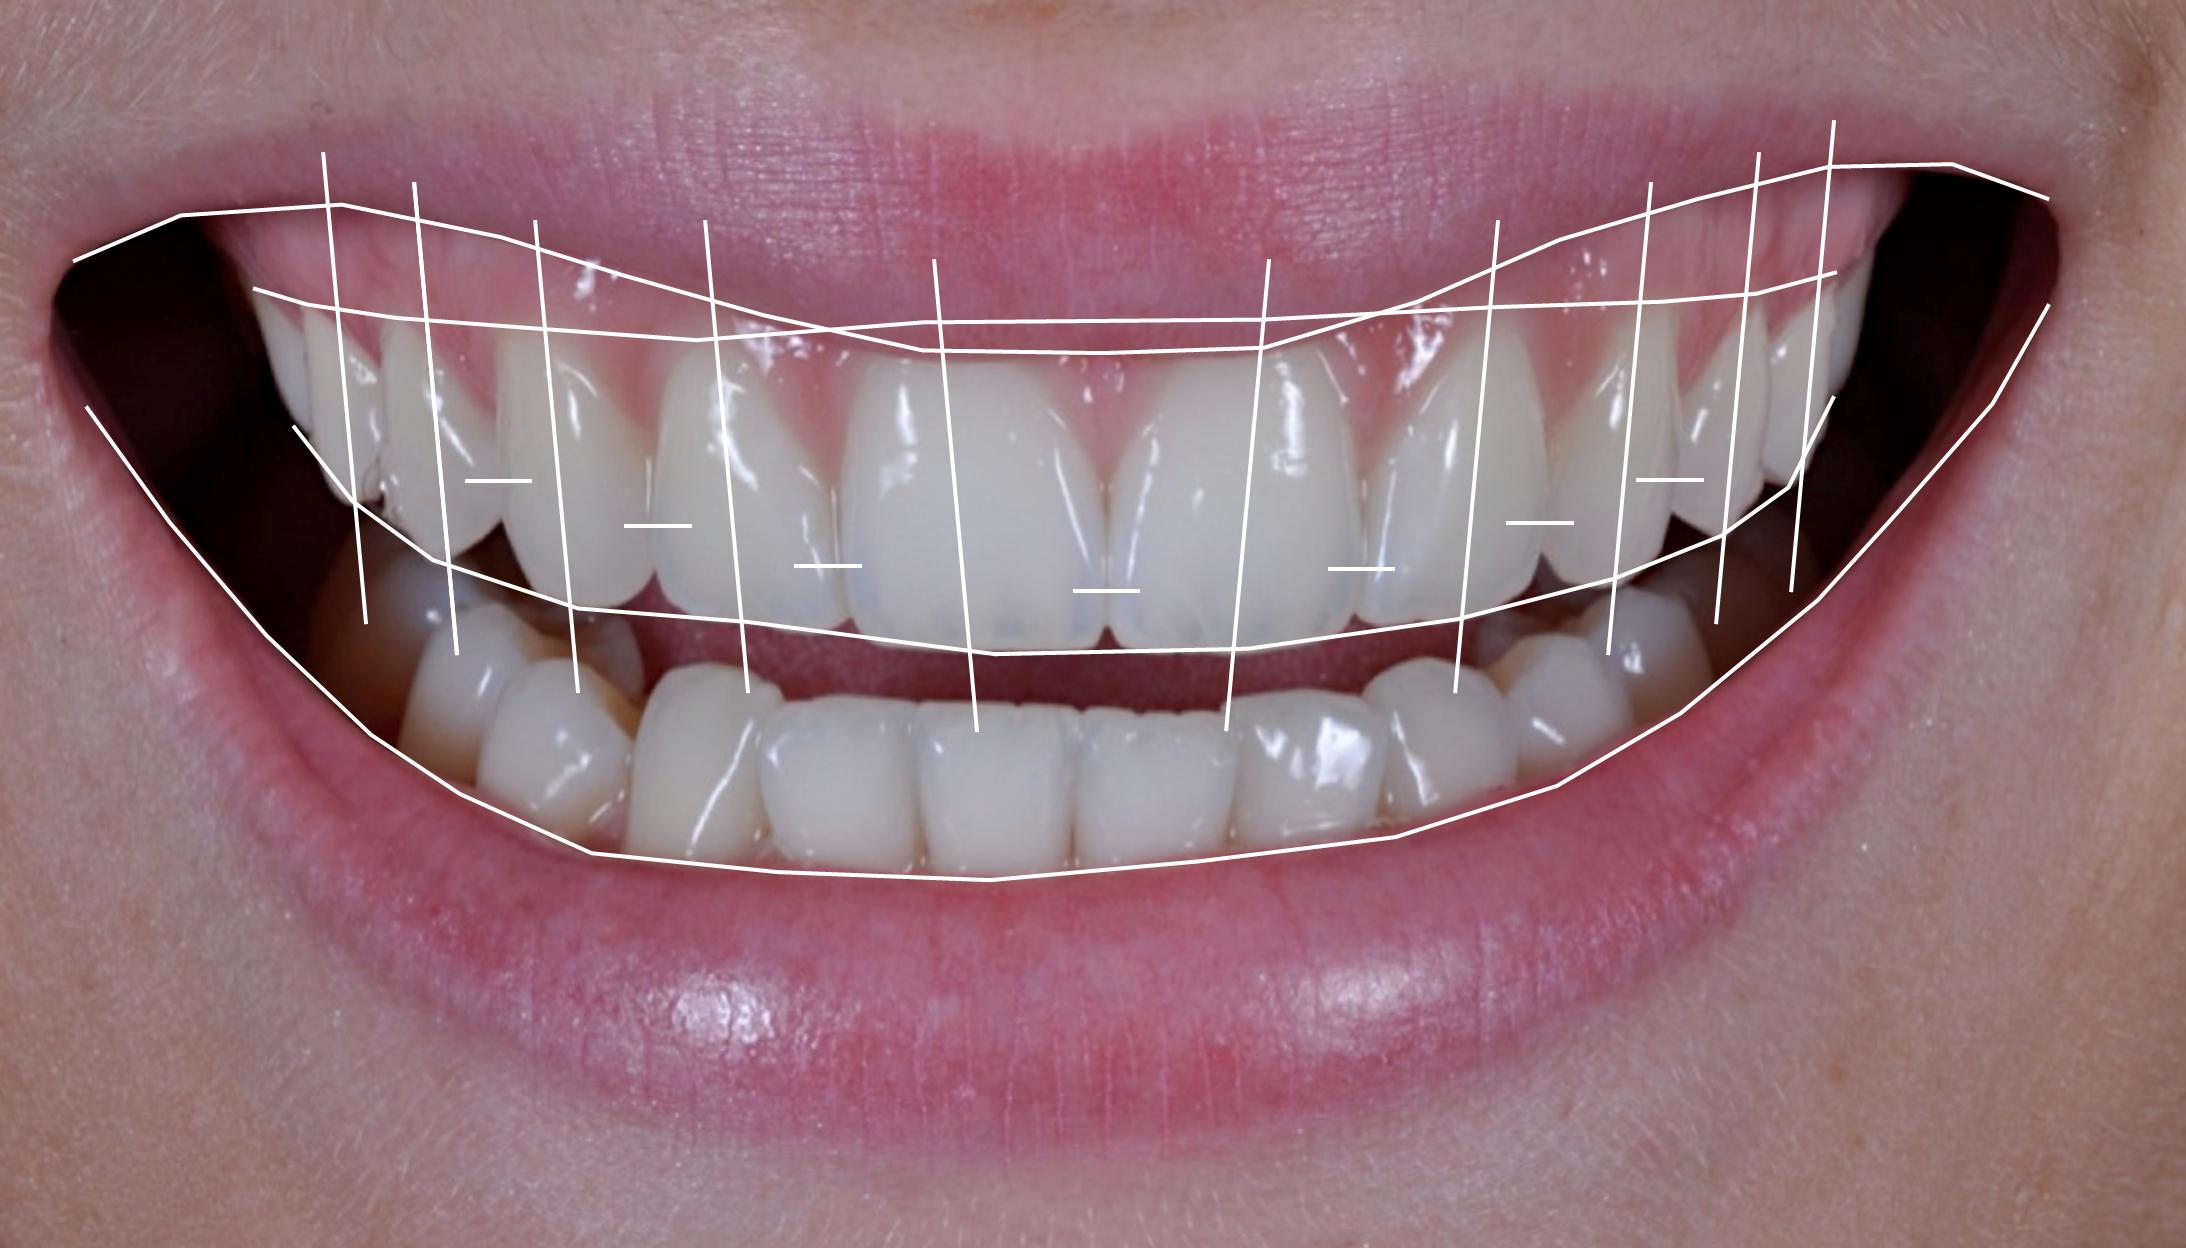 Importância da fotografia digital na Odontologia